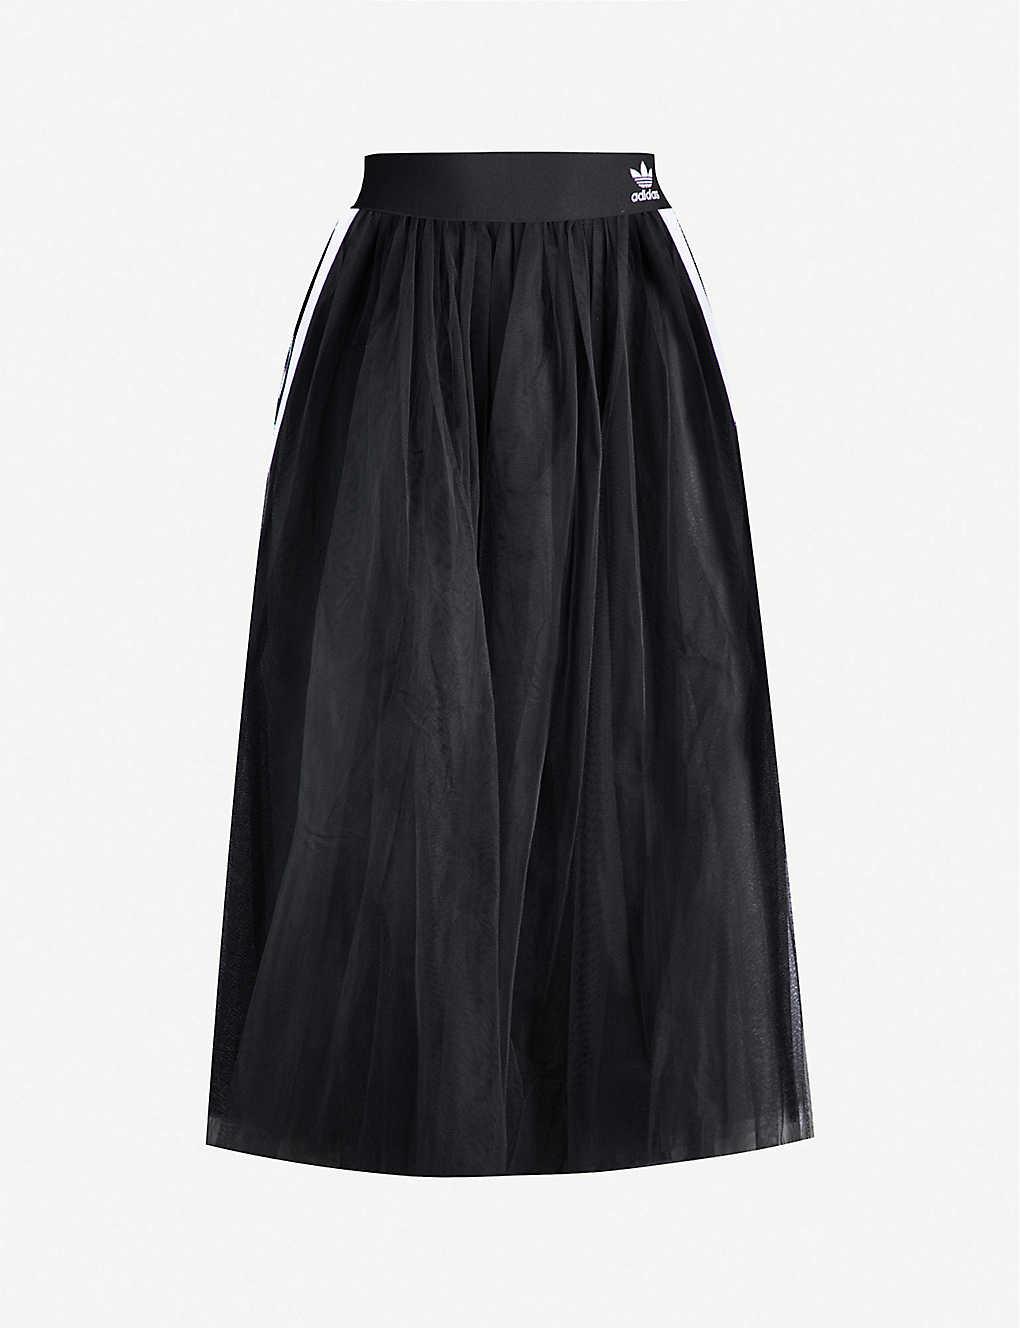 795f6a689e ADIDAS ORIGINALS - 3-stripe semi-sheer tulle midi skirt | Selfridges.com